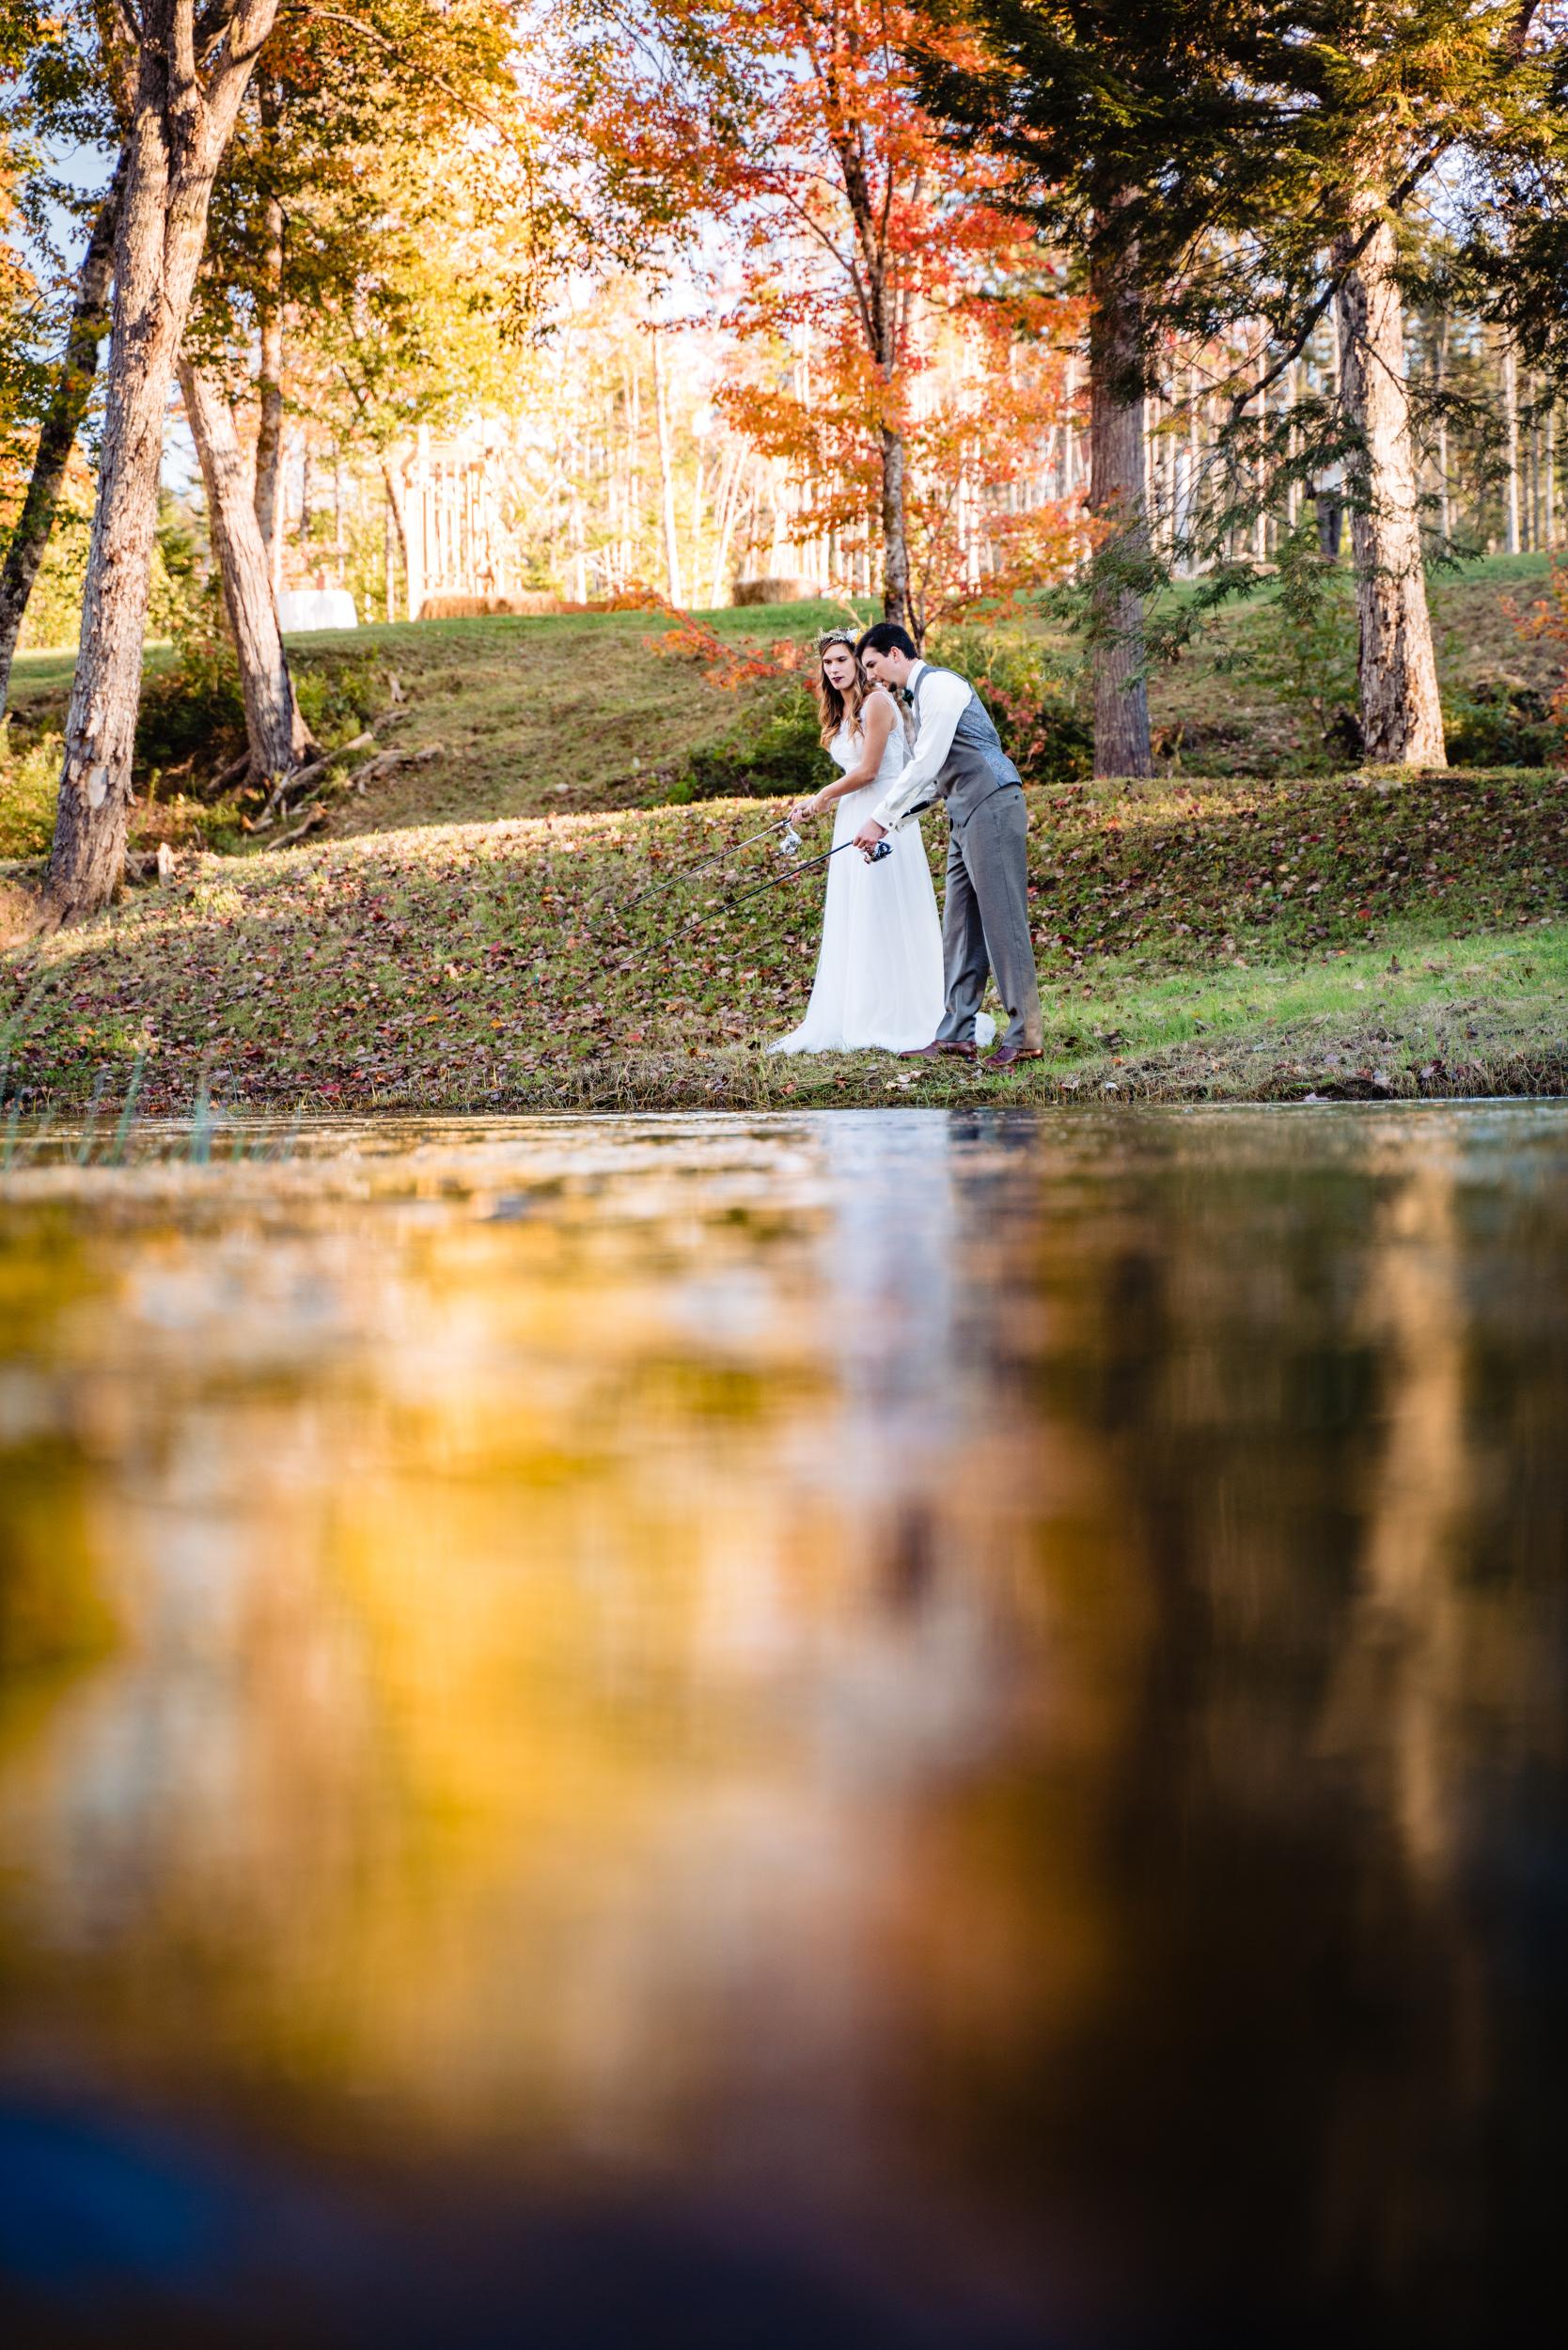 Halifax-wedding-photography-fall-photographers-novascotia-canada-ottawa (68 of 97).jpg